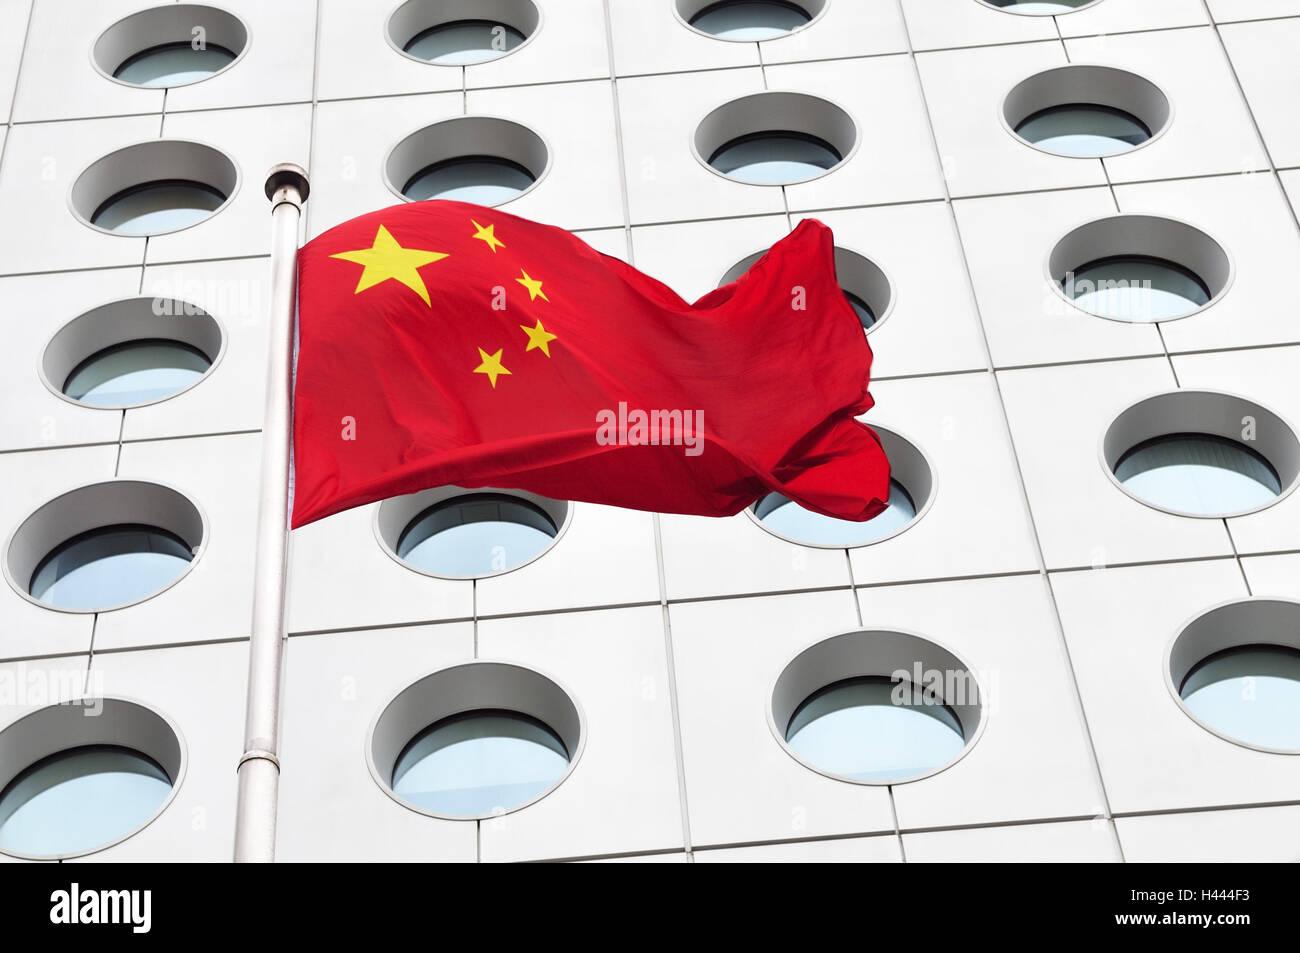 Flag, stars, flagpole, facade, window, red, white, China, Hong Kong, - Stock Image